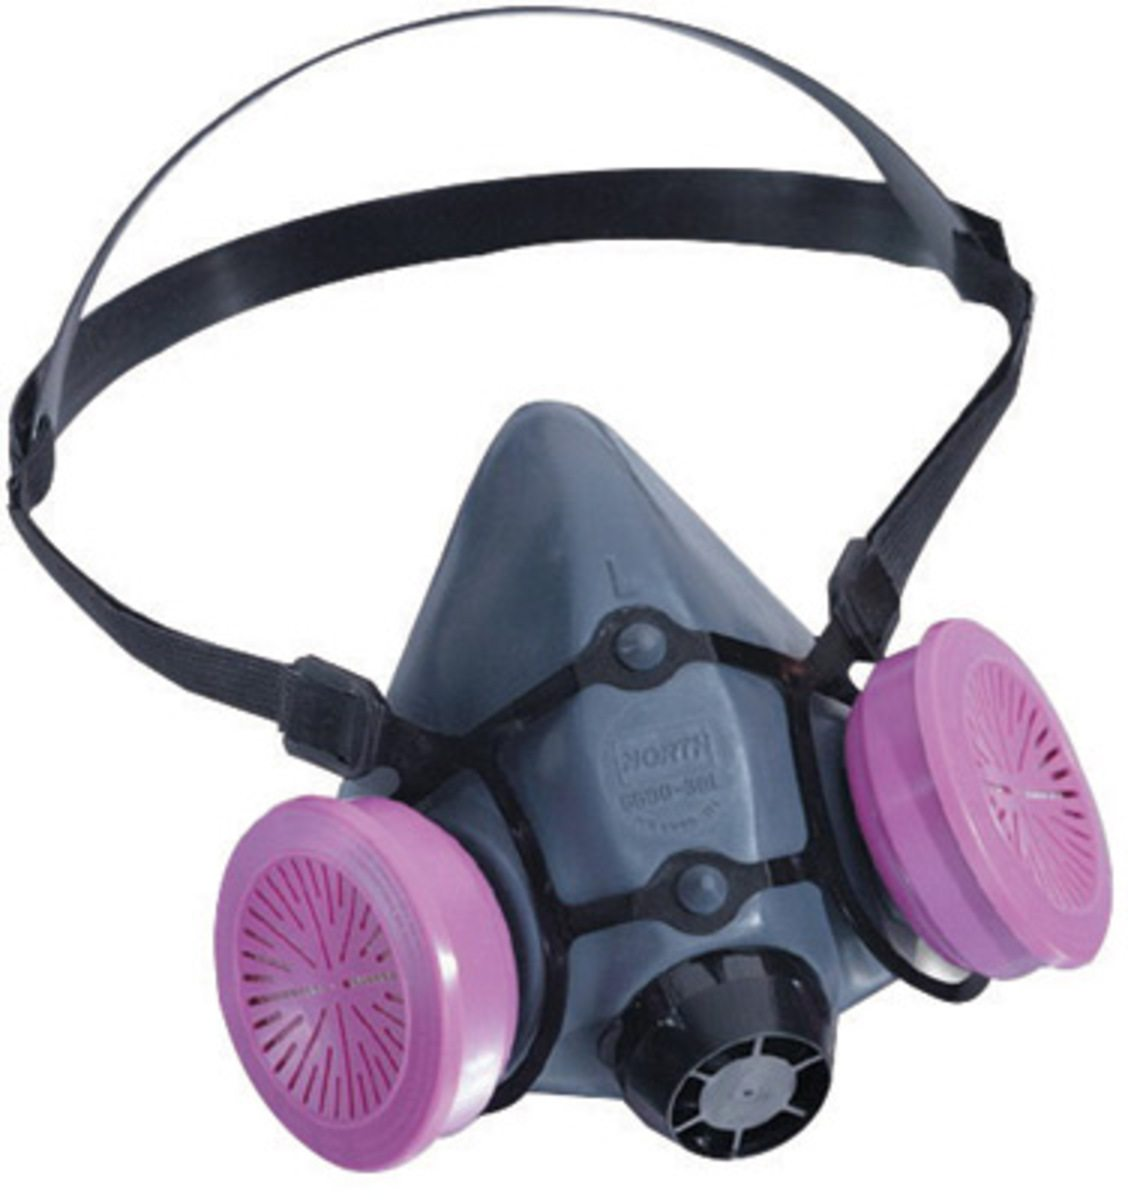 North half face respirator